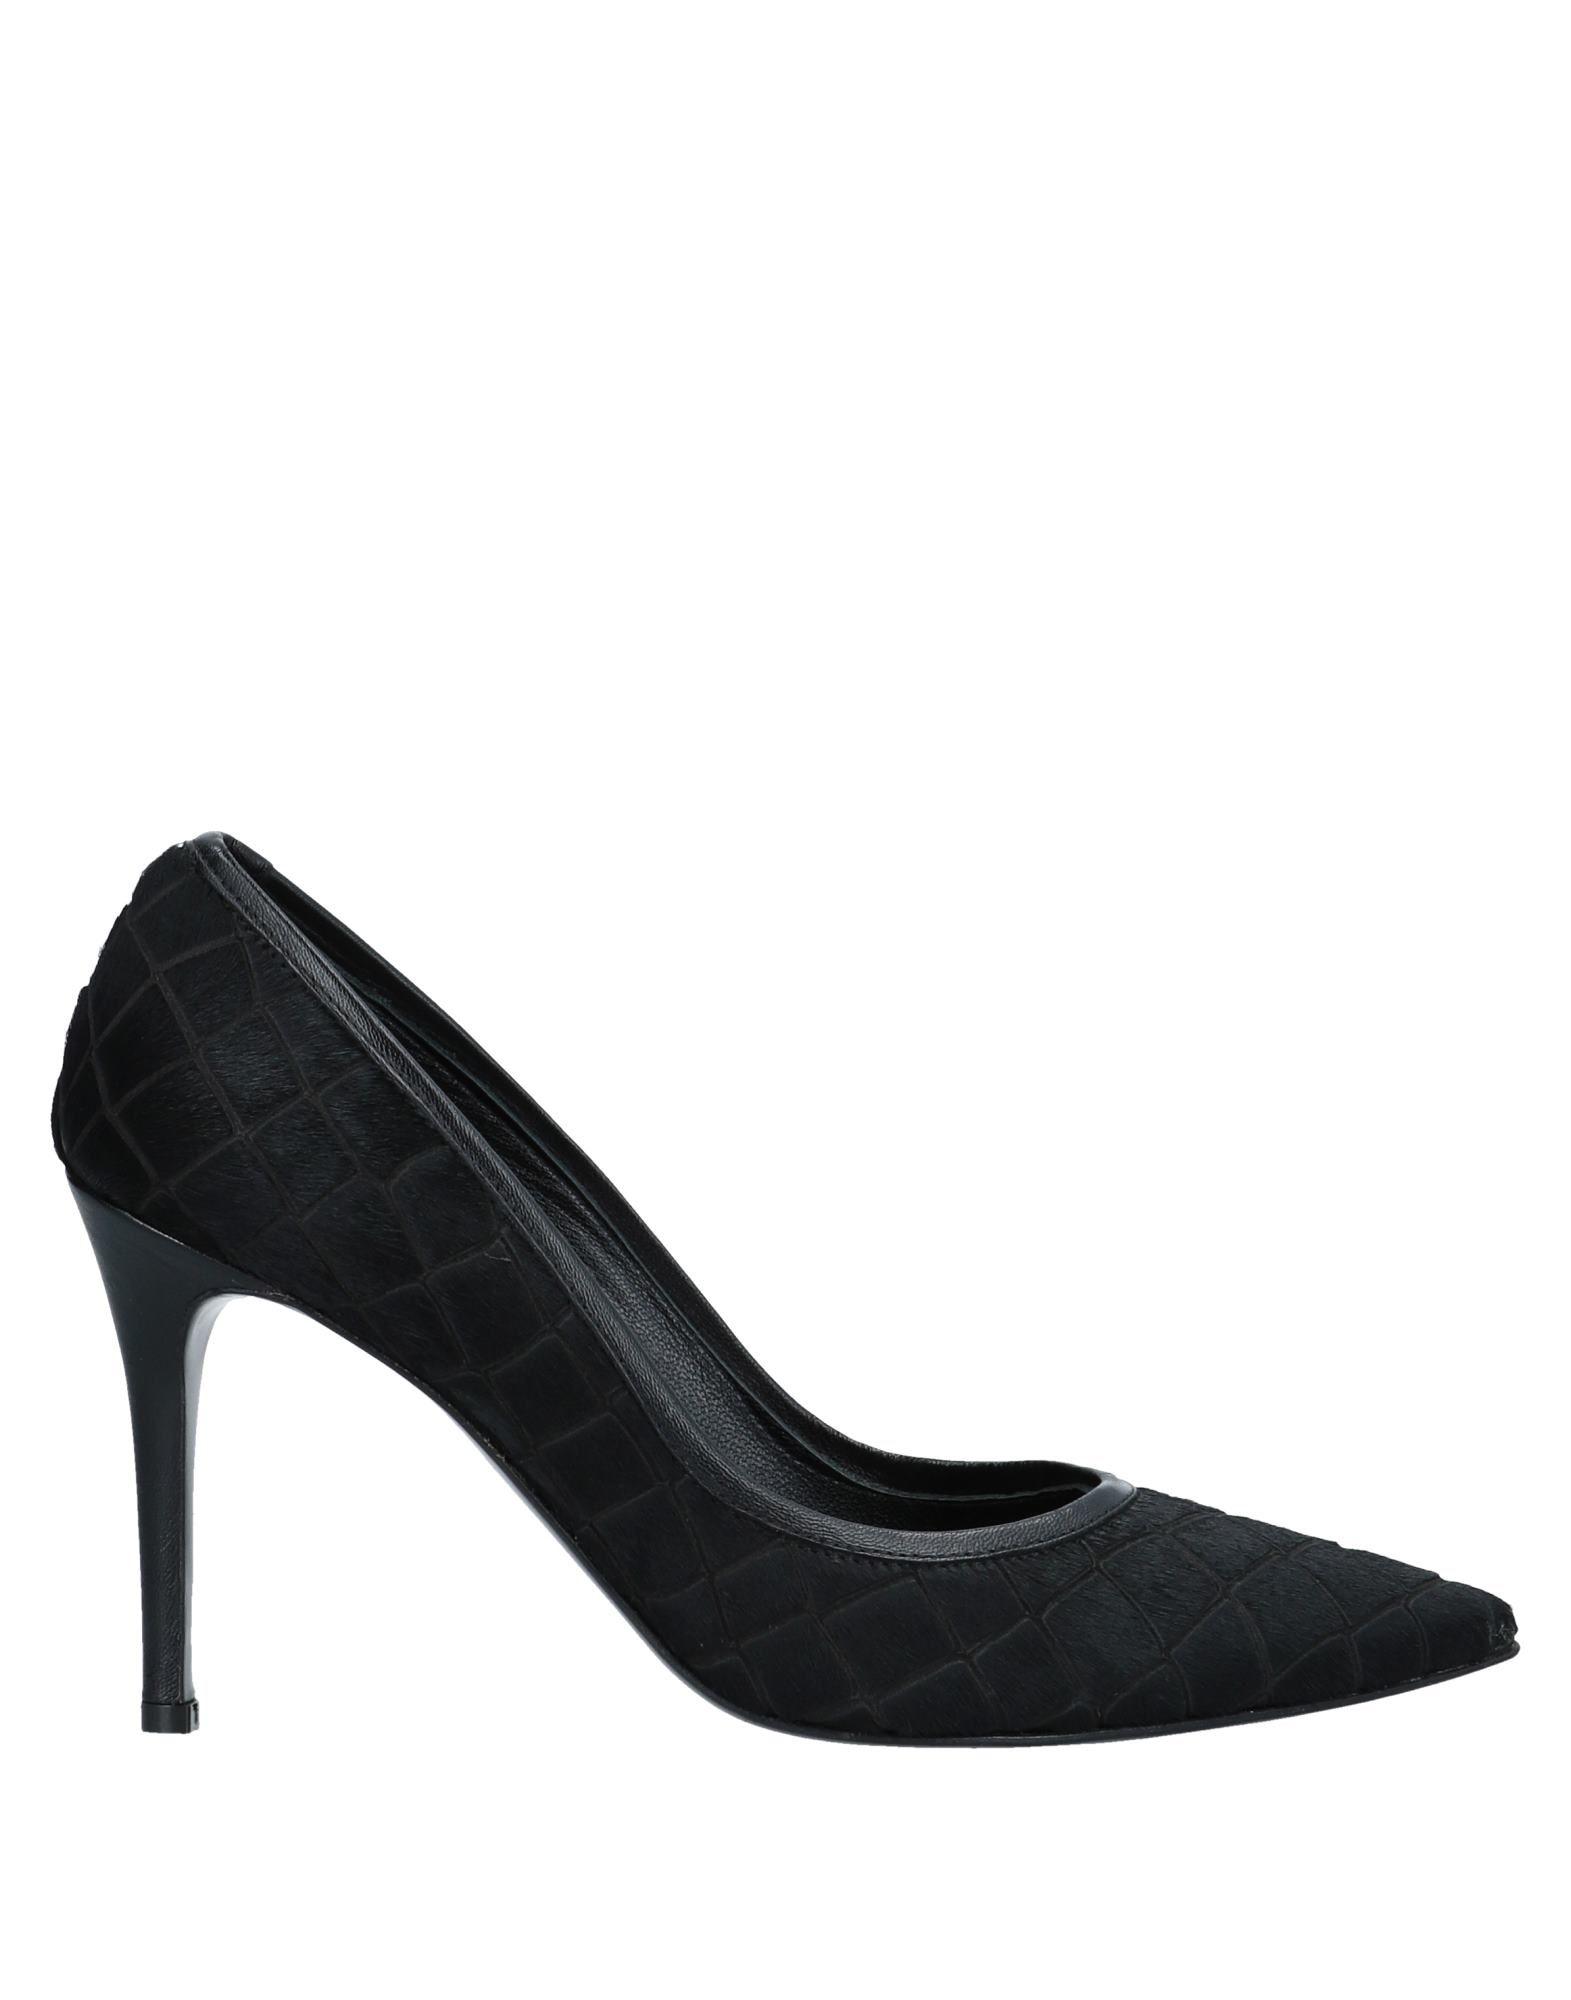 Schuhe Bizz Paris Qualität Pumps Damen 11559316WB Gute Qualität Paris beliebte Schuhe 938dd6